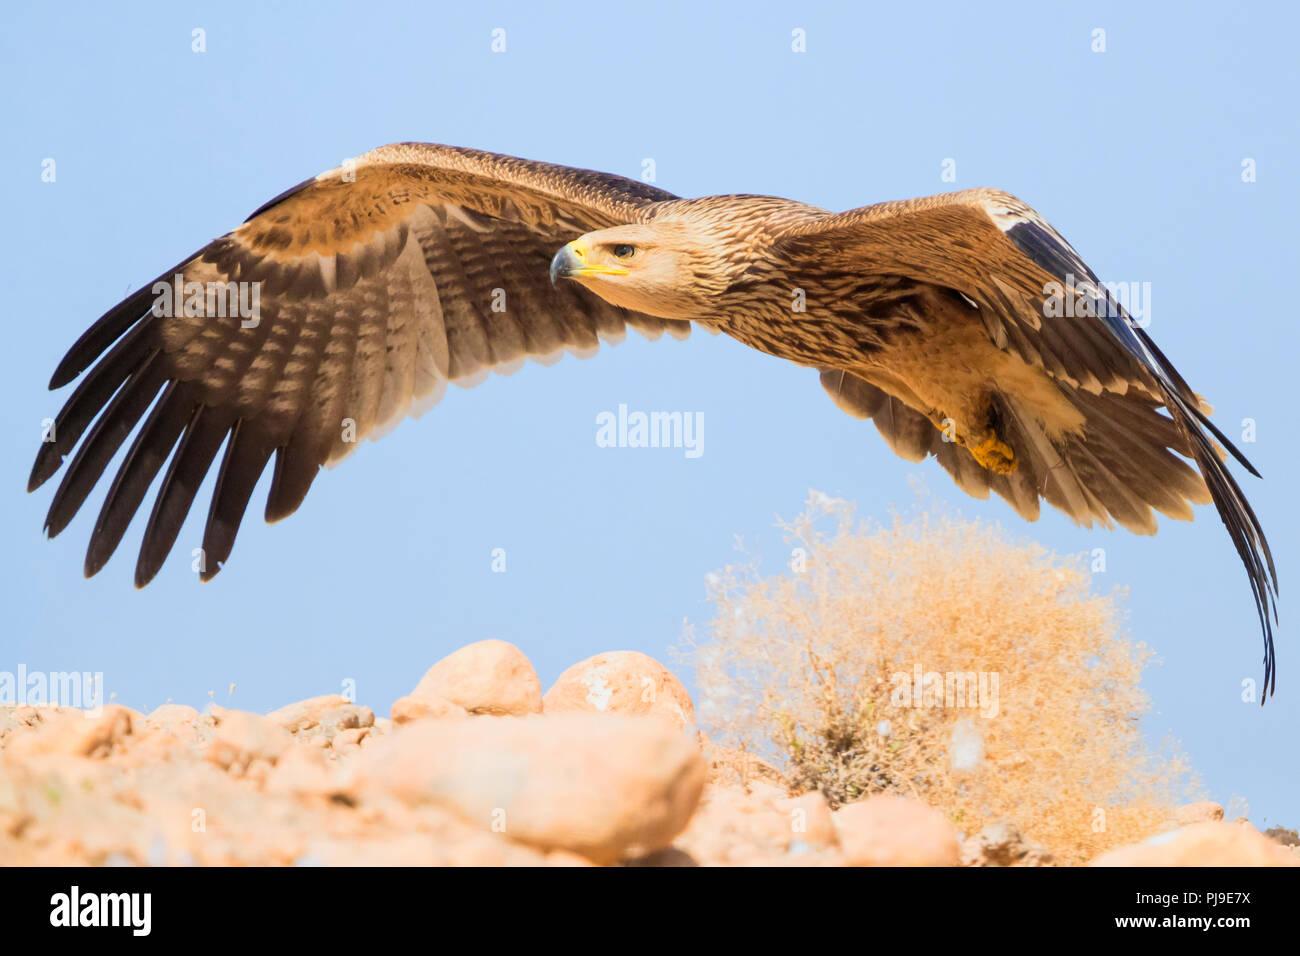 Eastern Imperial Eagle (Aquila heliaca), juvenile in flight - Stock Image